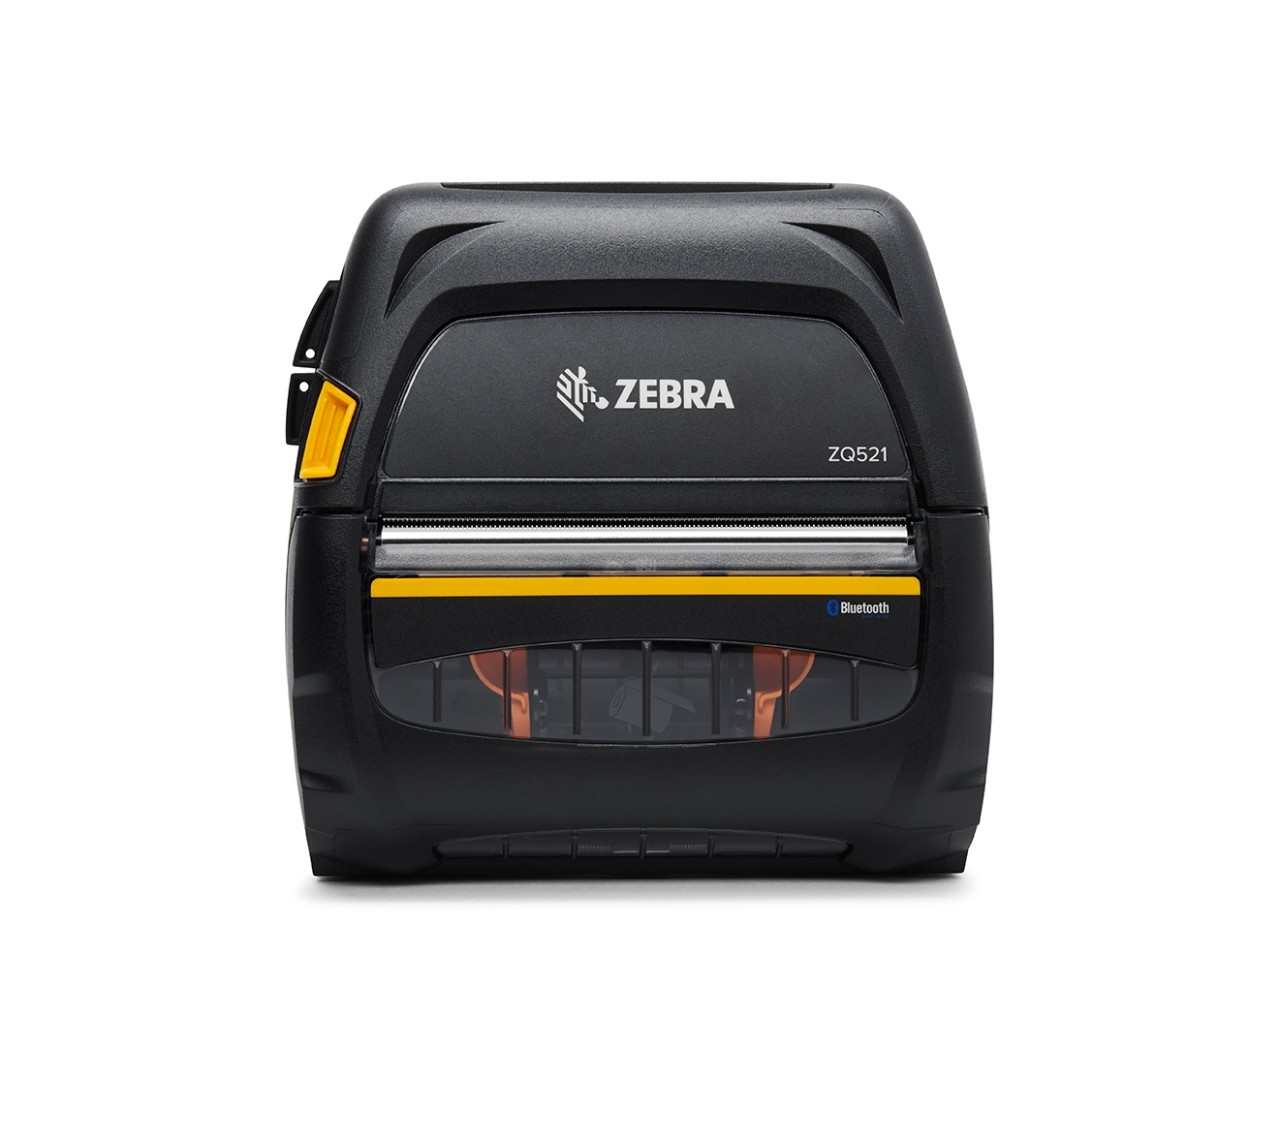 Impresora móvil ZQ521